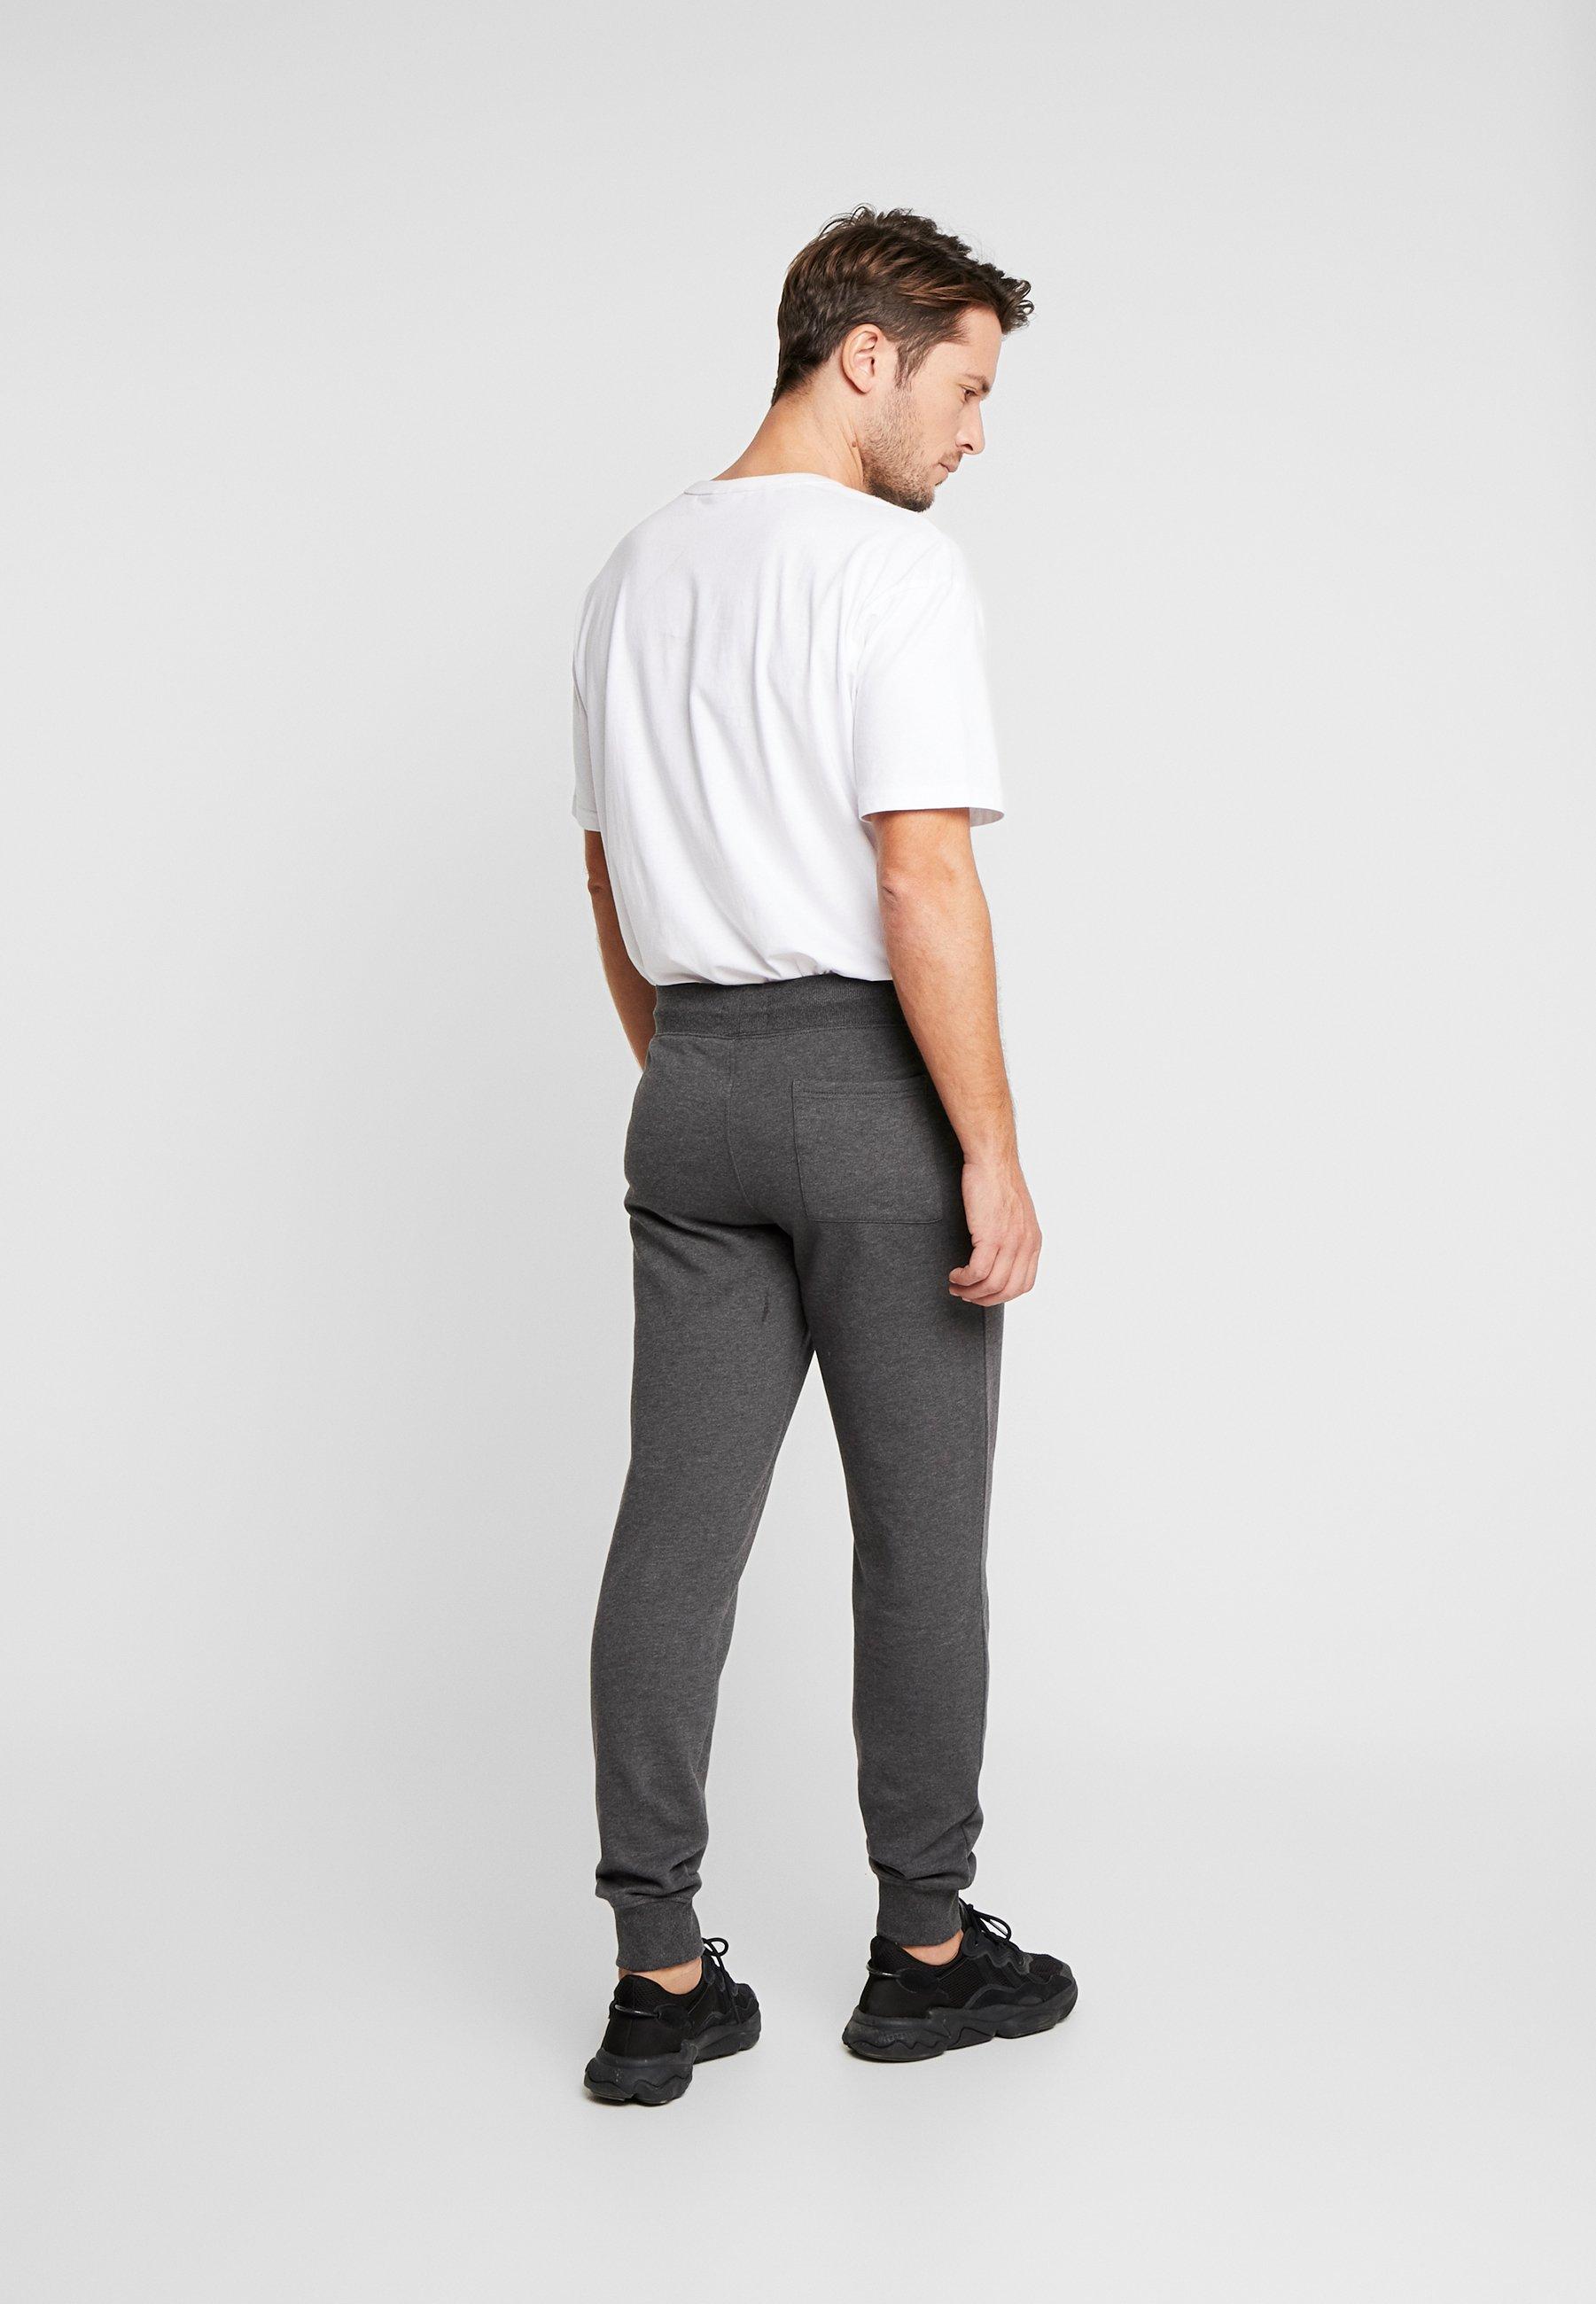 Grey Pier Sportivi One Dark Pantaloni Mottled XZPkiOu